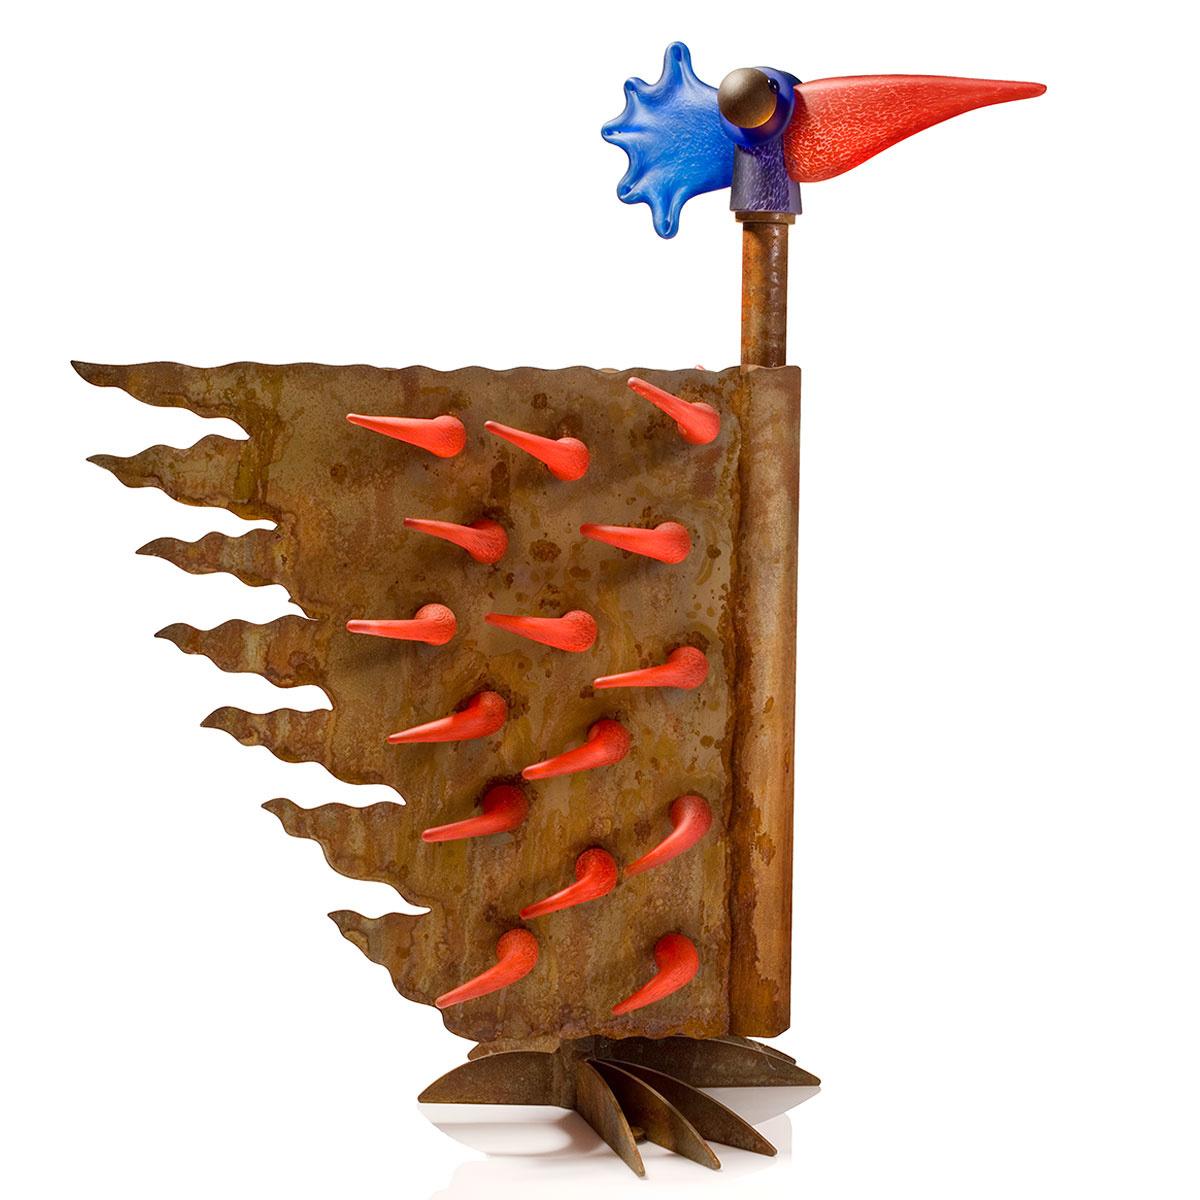 Borowski  FIREBIRD SMALL - Outdoor-object, red-1